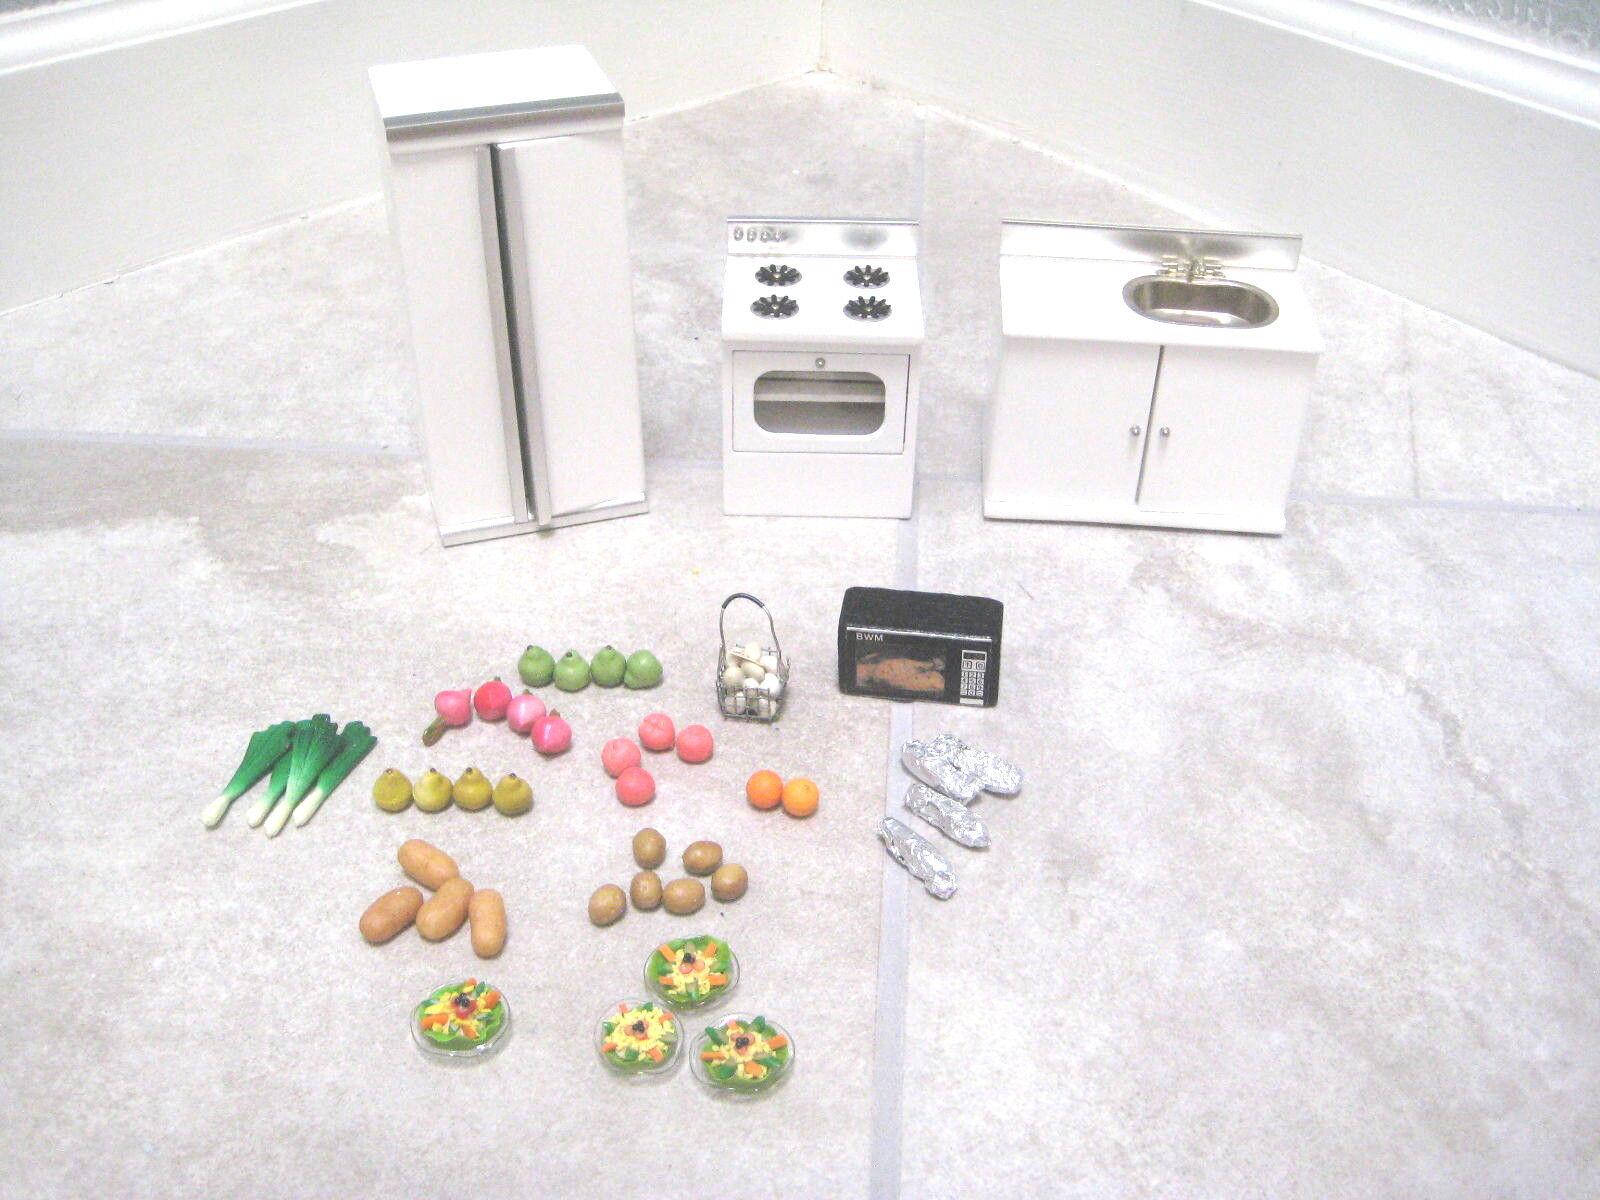 bambolahouse Miniature KITCHEN OVEN  SINK REFRIGERATOR Vegetables Salad FRUITS 1 12  fino al 50% di sconto